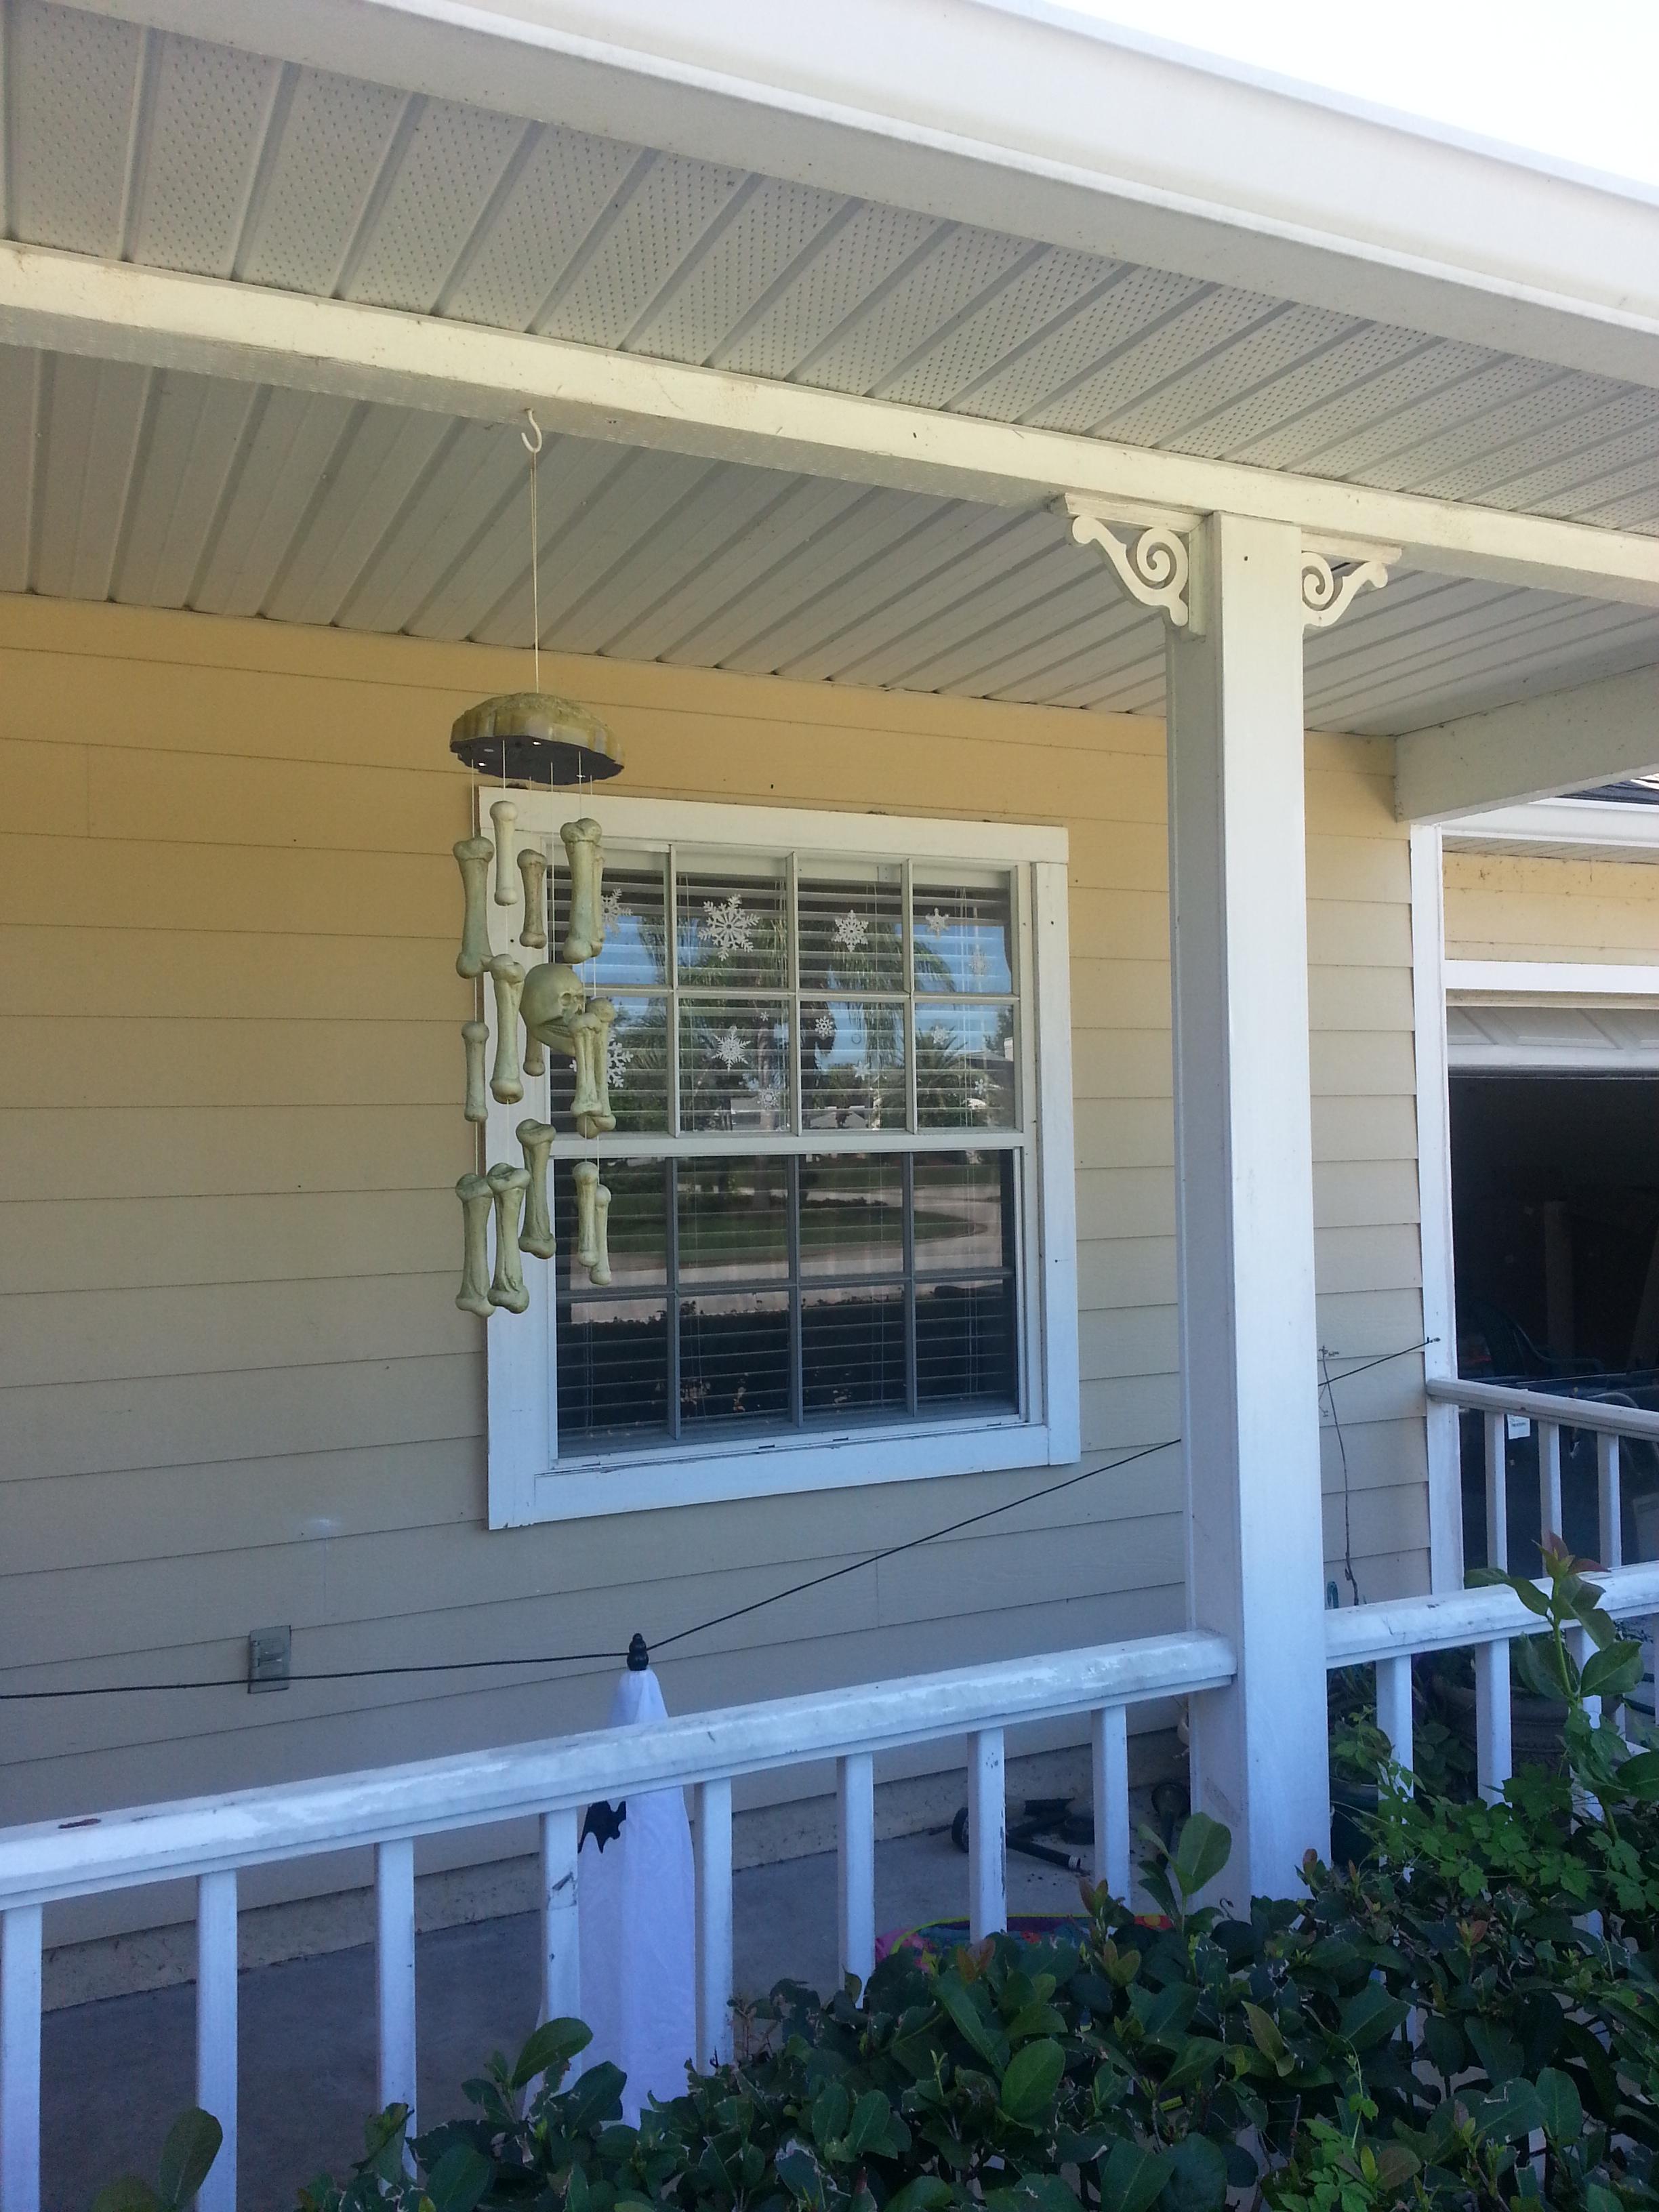 Caulking And Sealing Of Windowsdoorsstorefrontcurtainwall And The